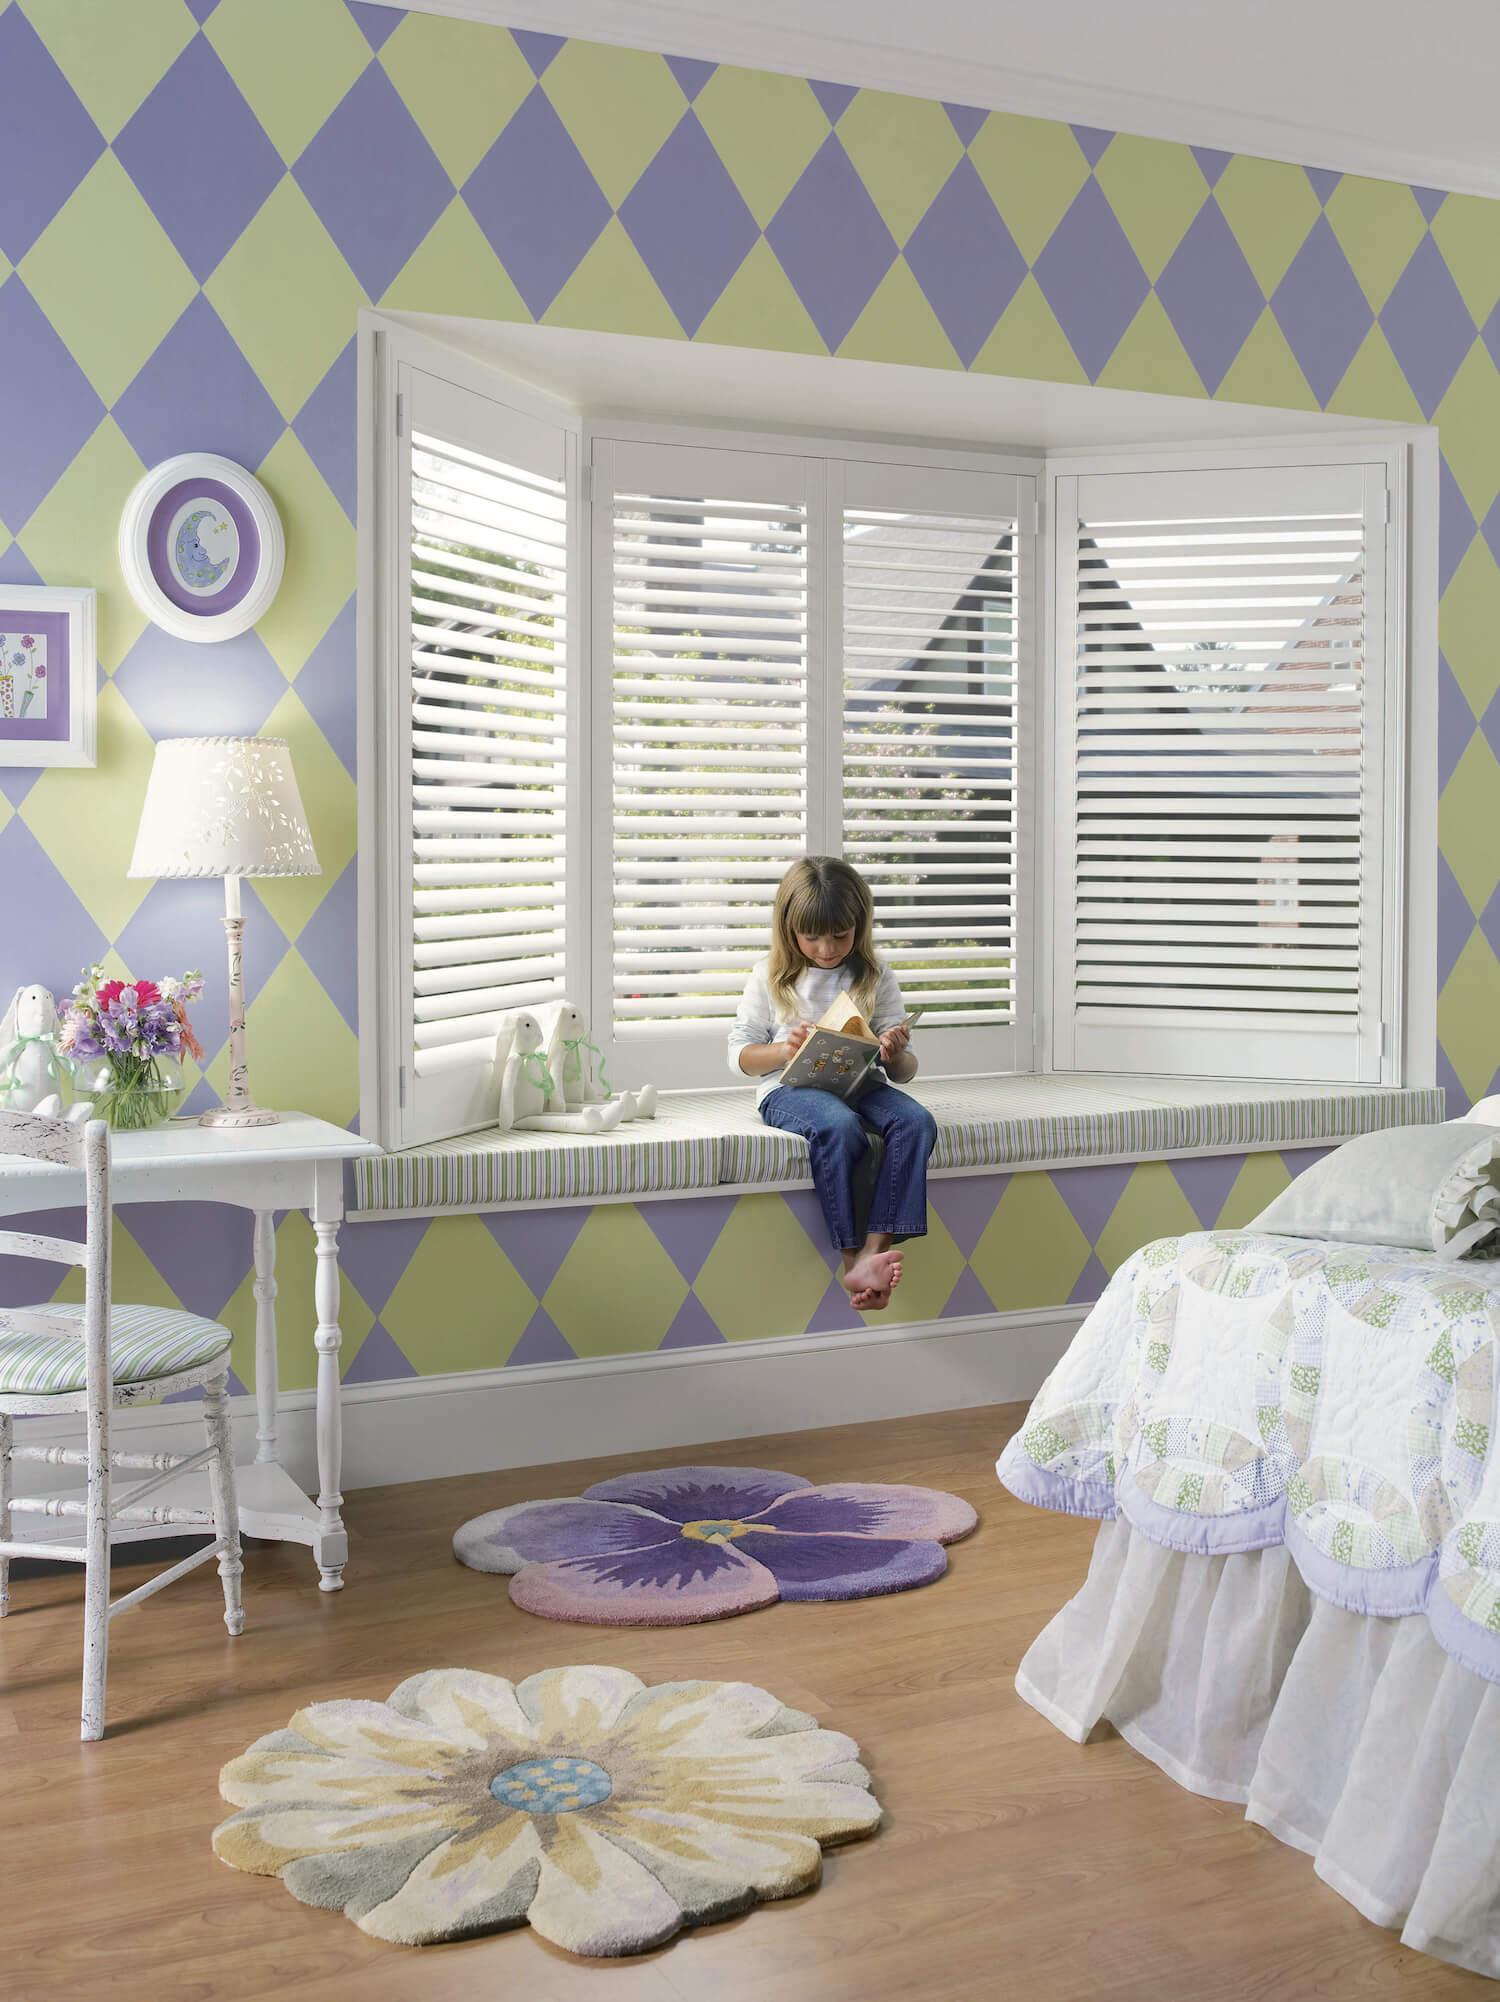 White Hardwood Shutters - Heritance Hardwood Shuttersin child's bay window